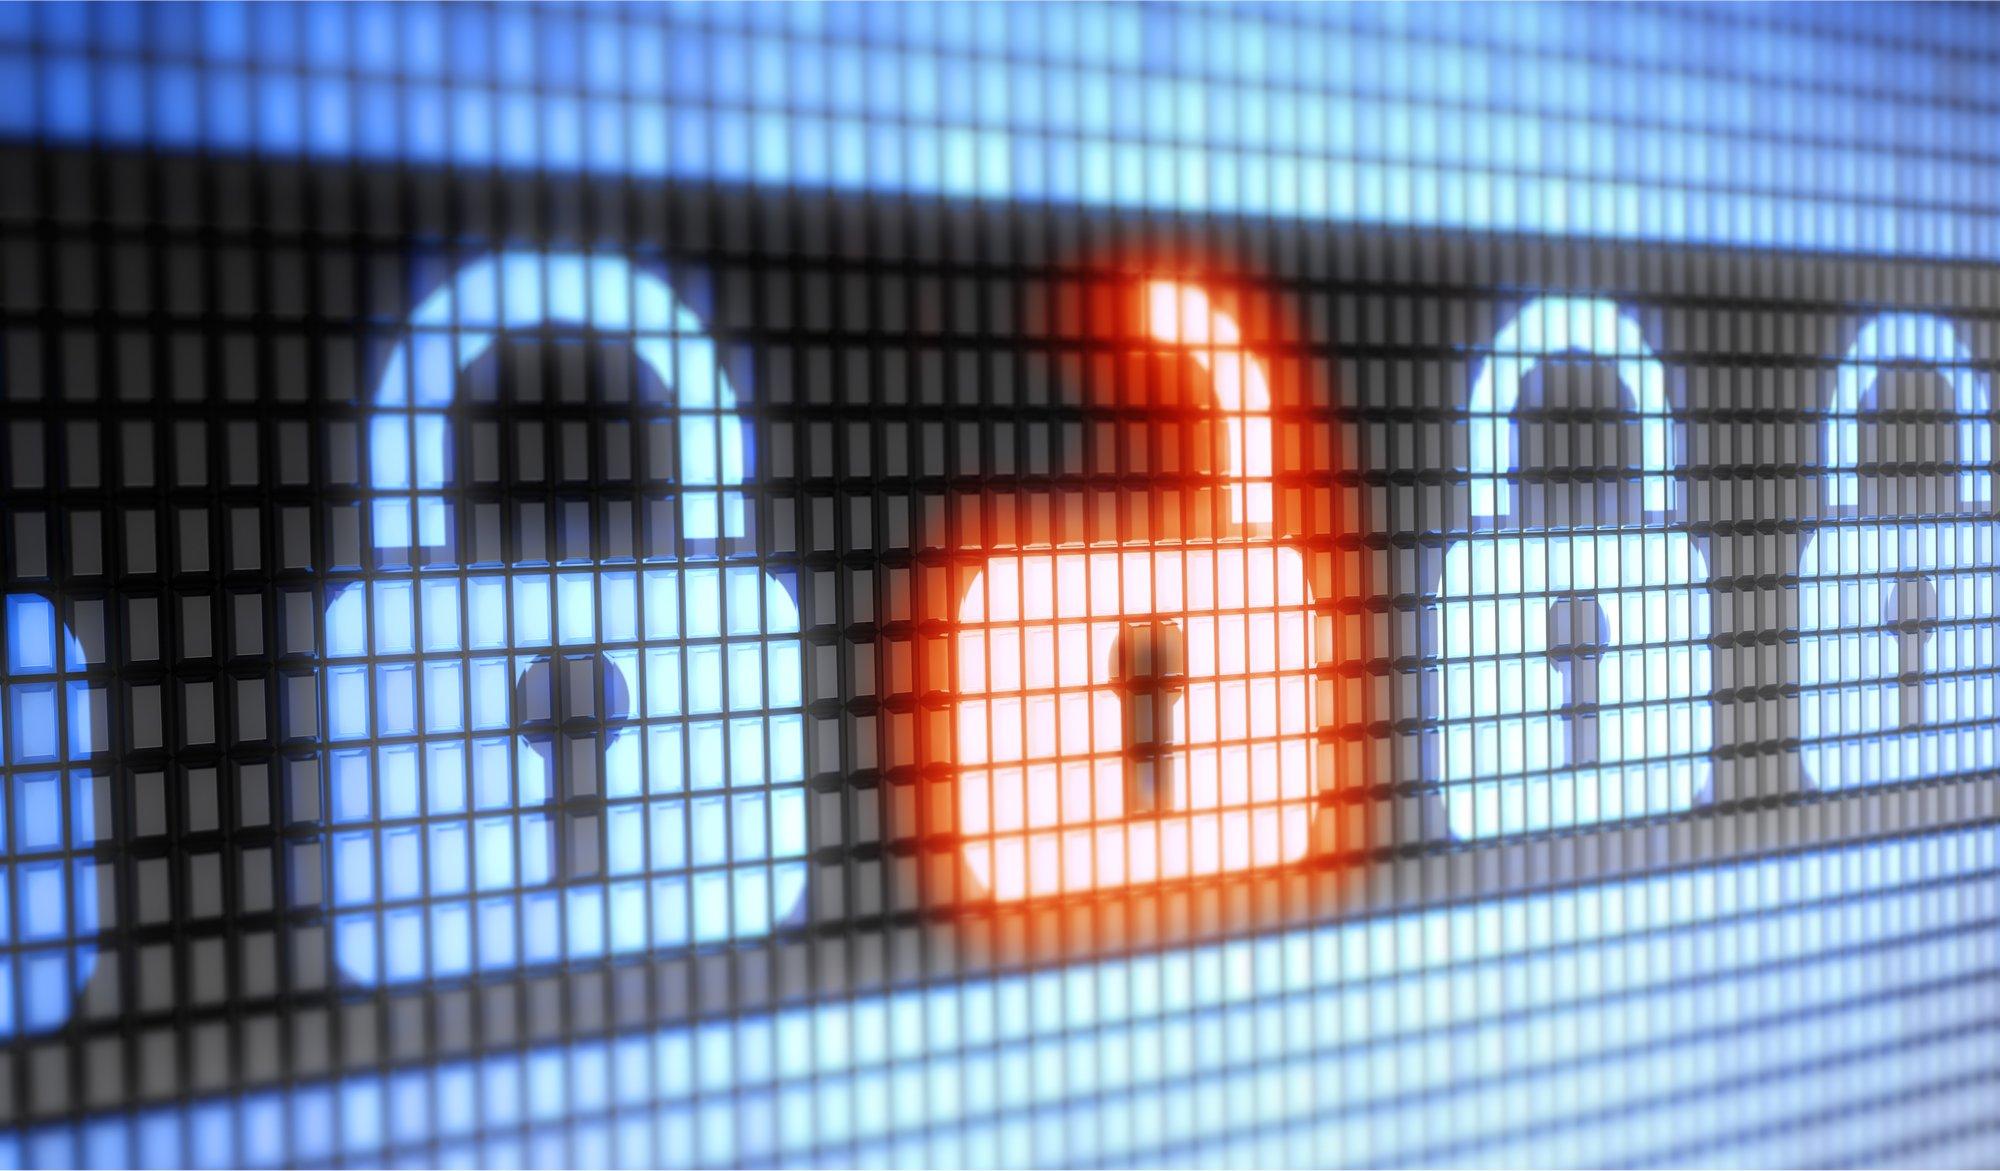 A row of digital padlocks representing cybersecurity.